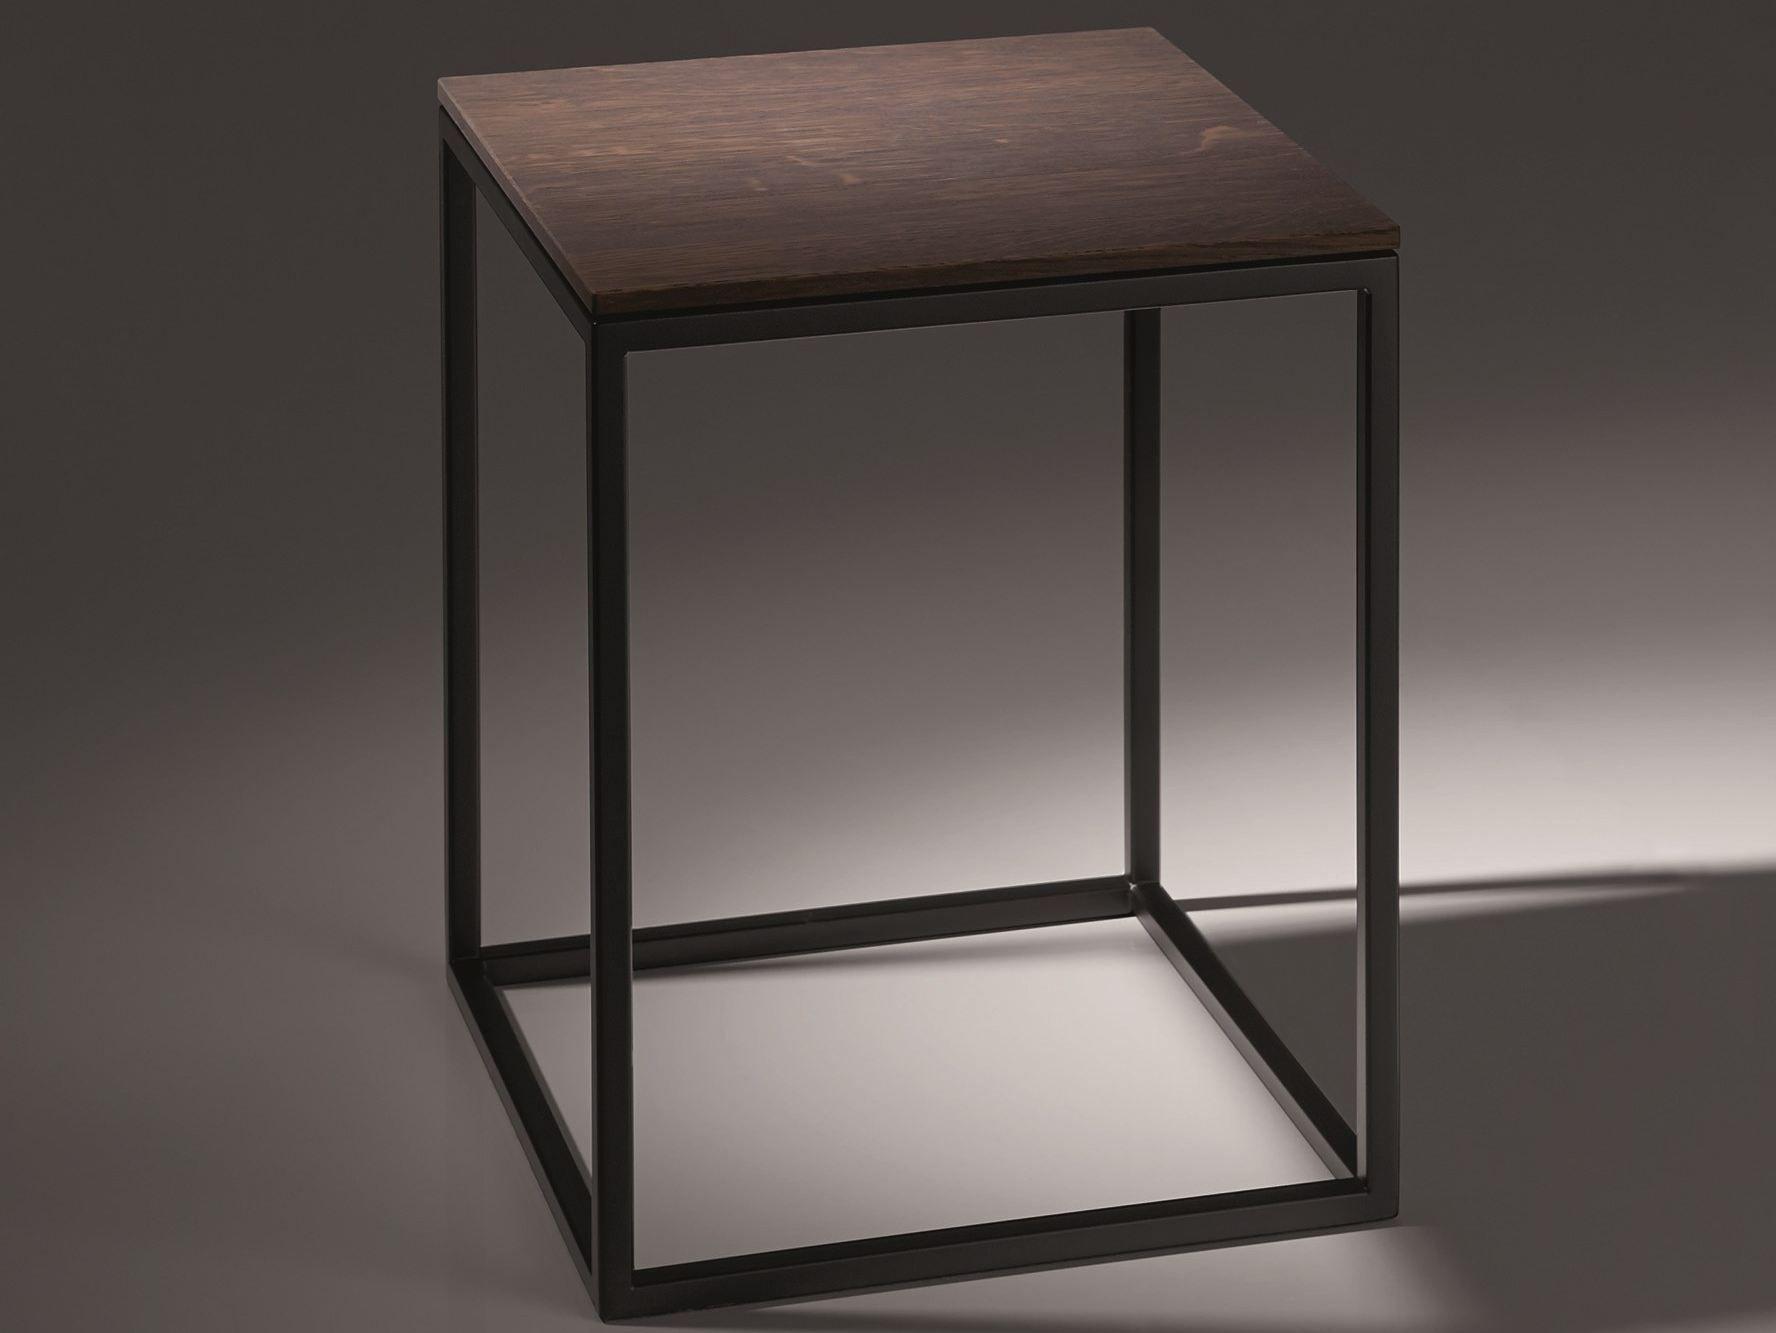 Bettelux shape sgabello per bagno by bette design tesseraux partner - Sgabello legno bagno ...